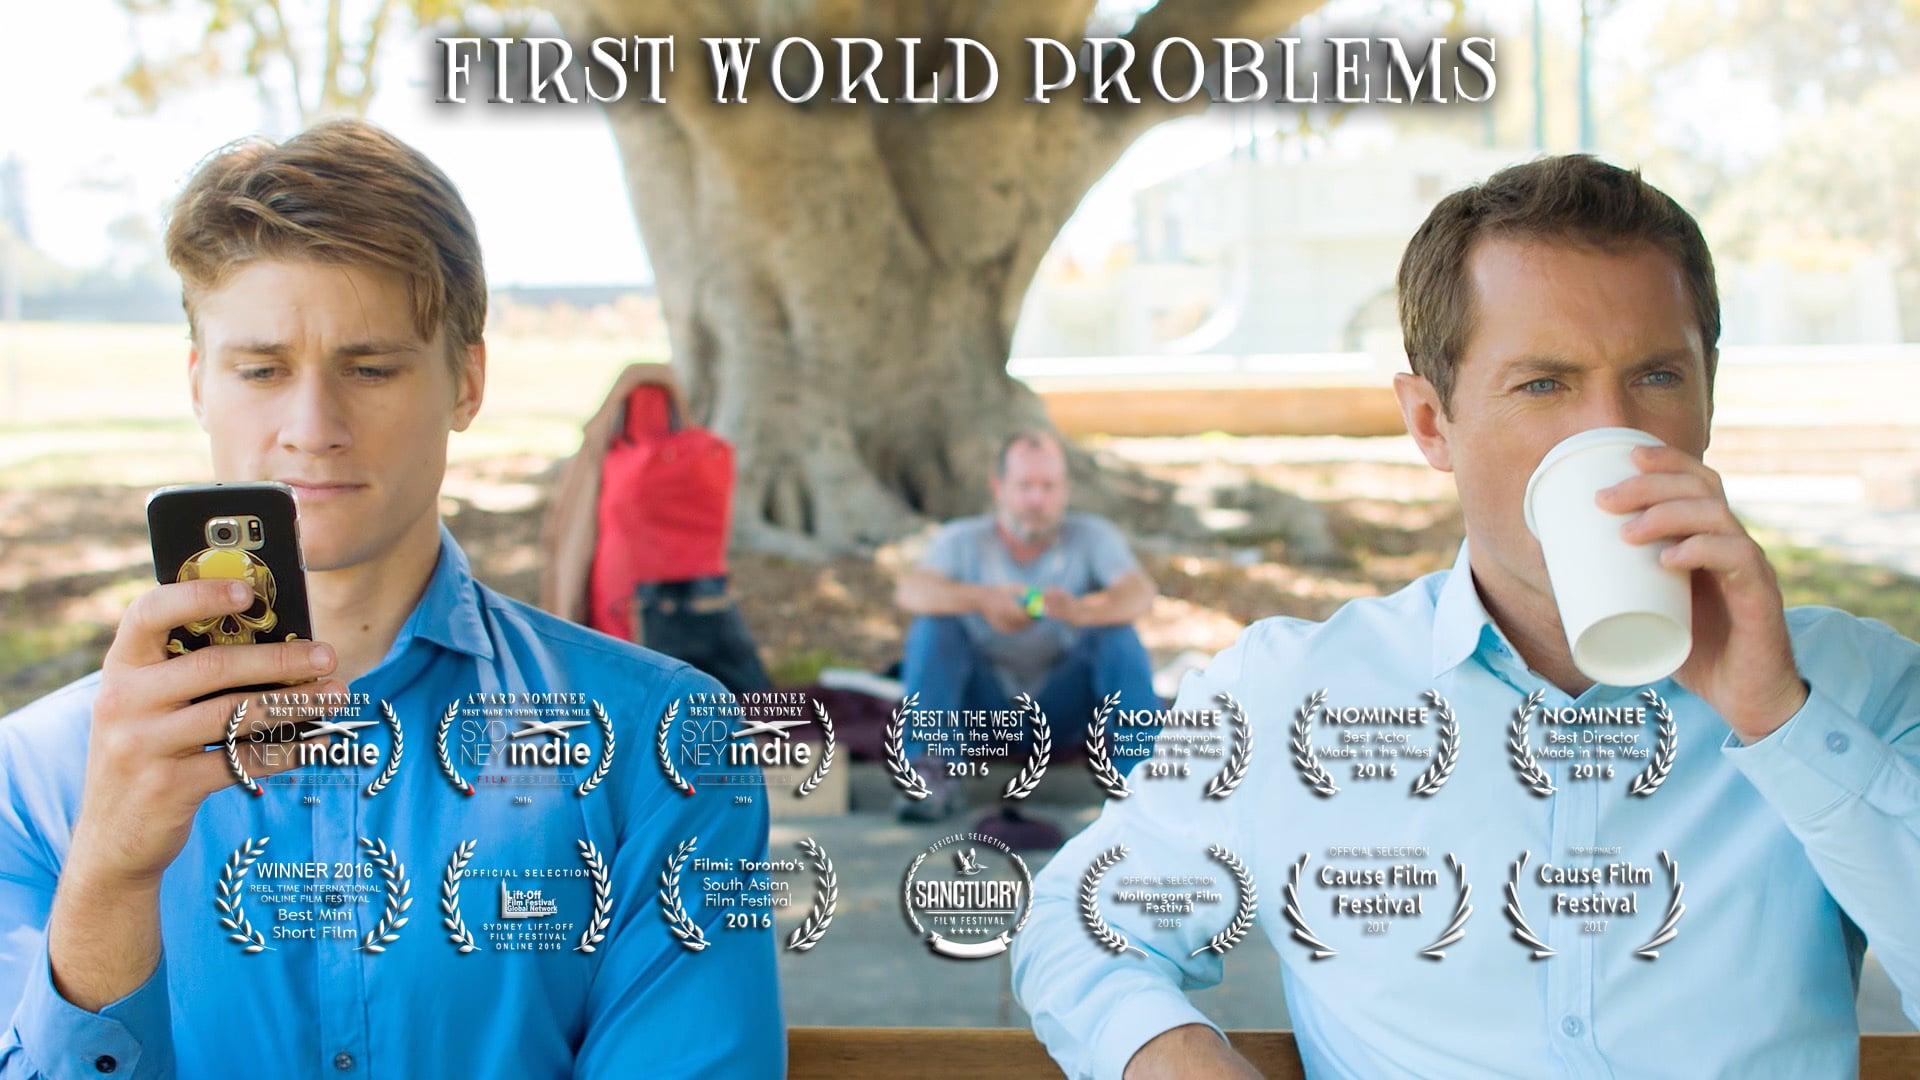 First World Problems (short film)